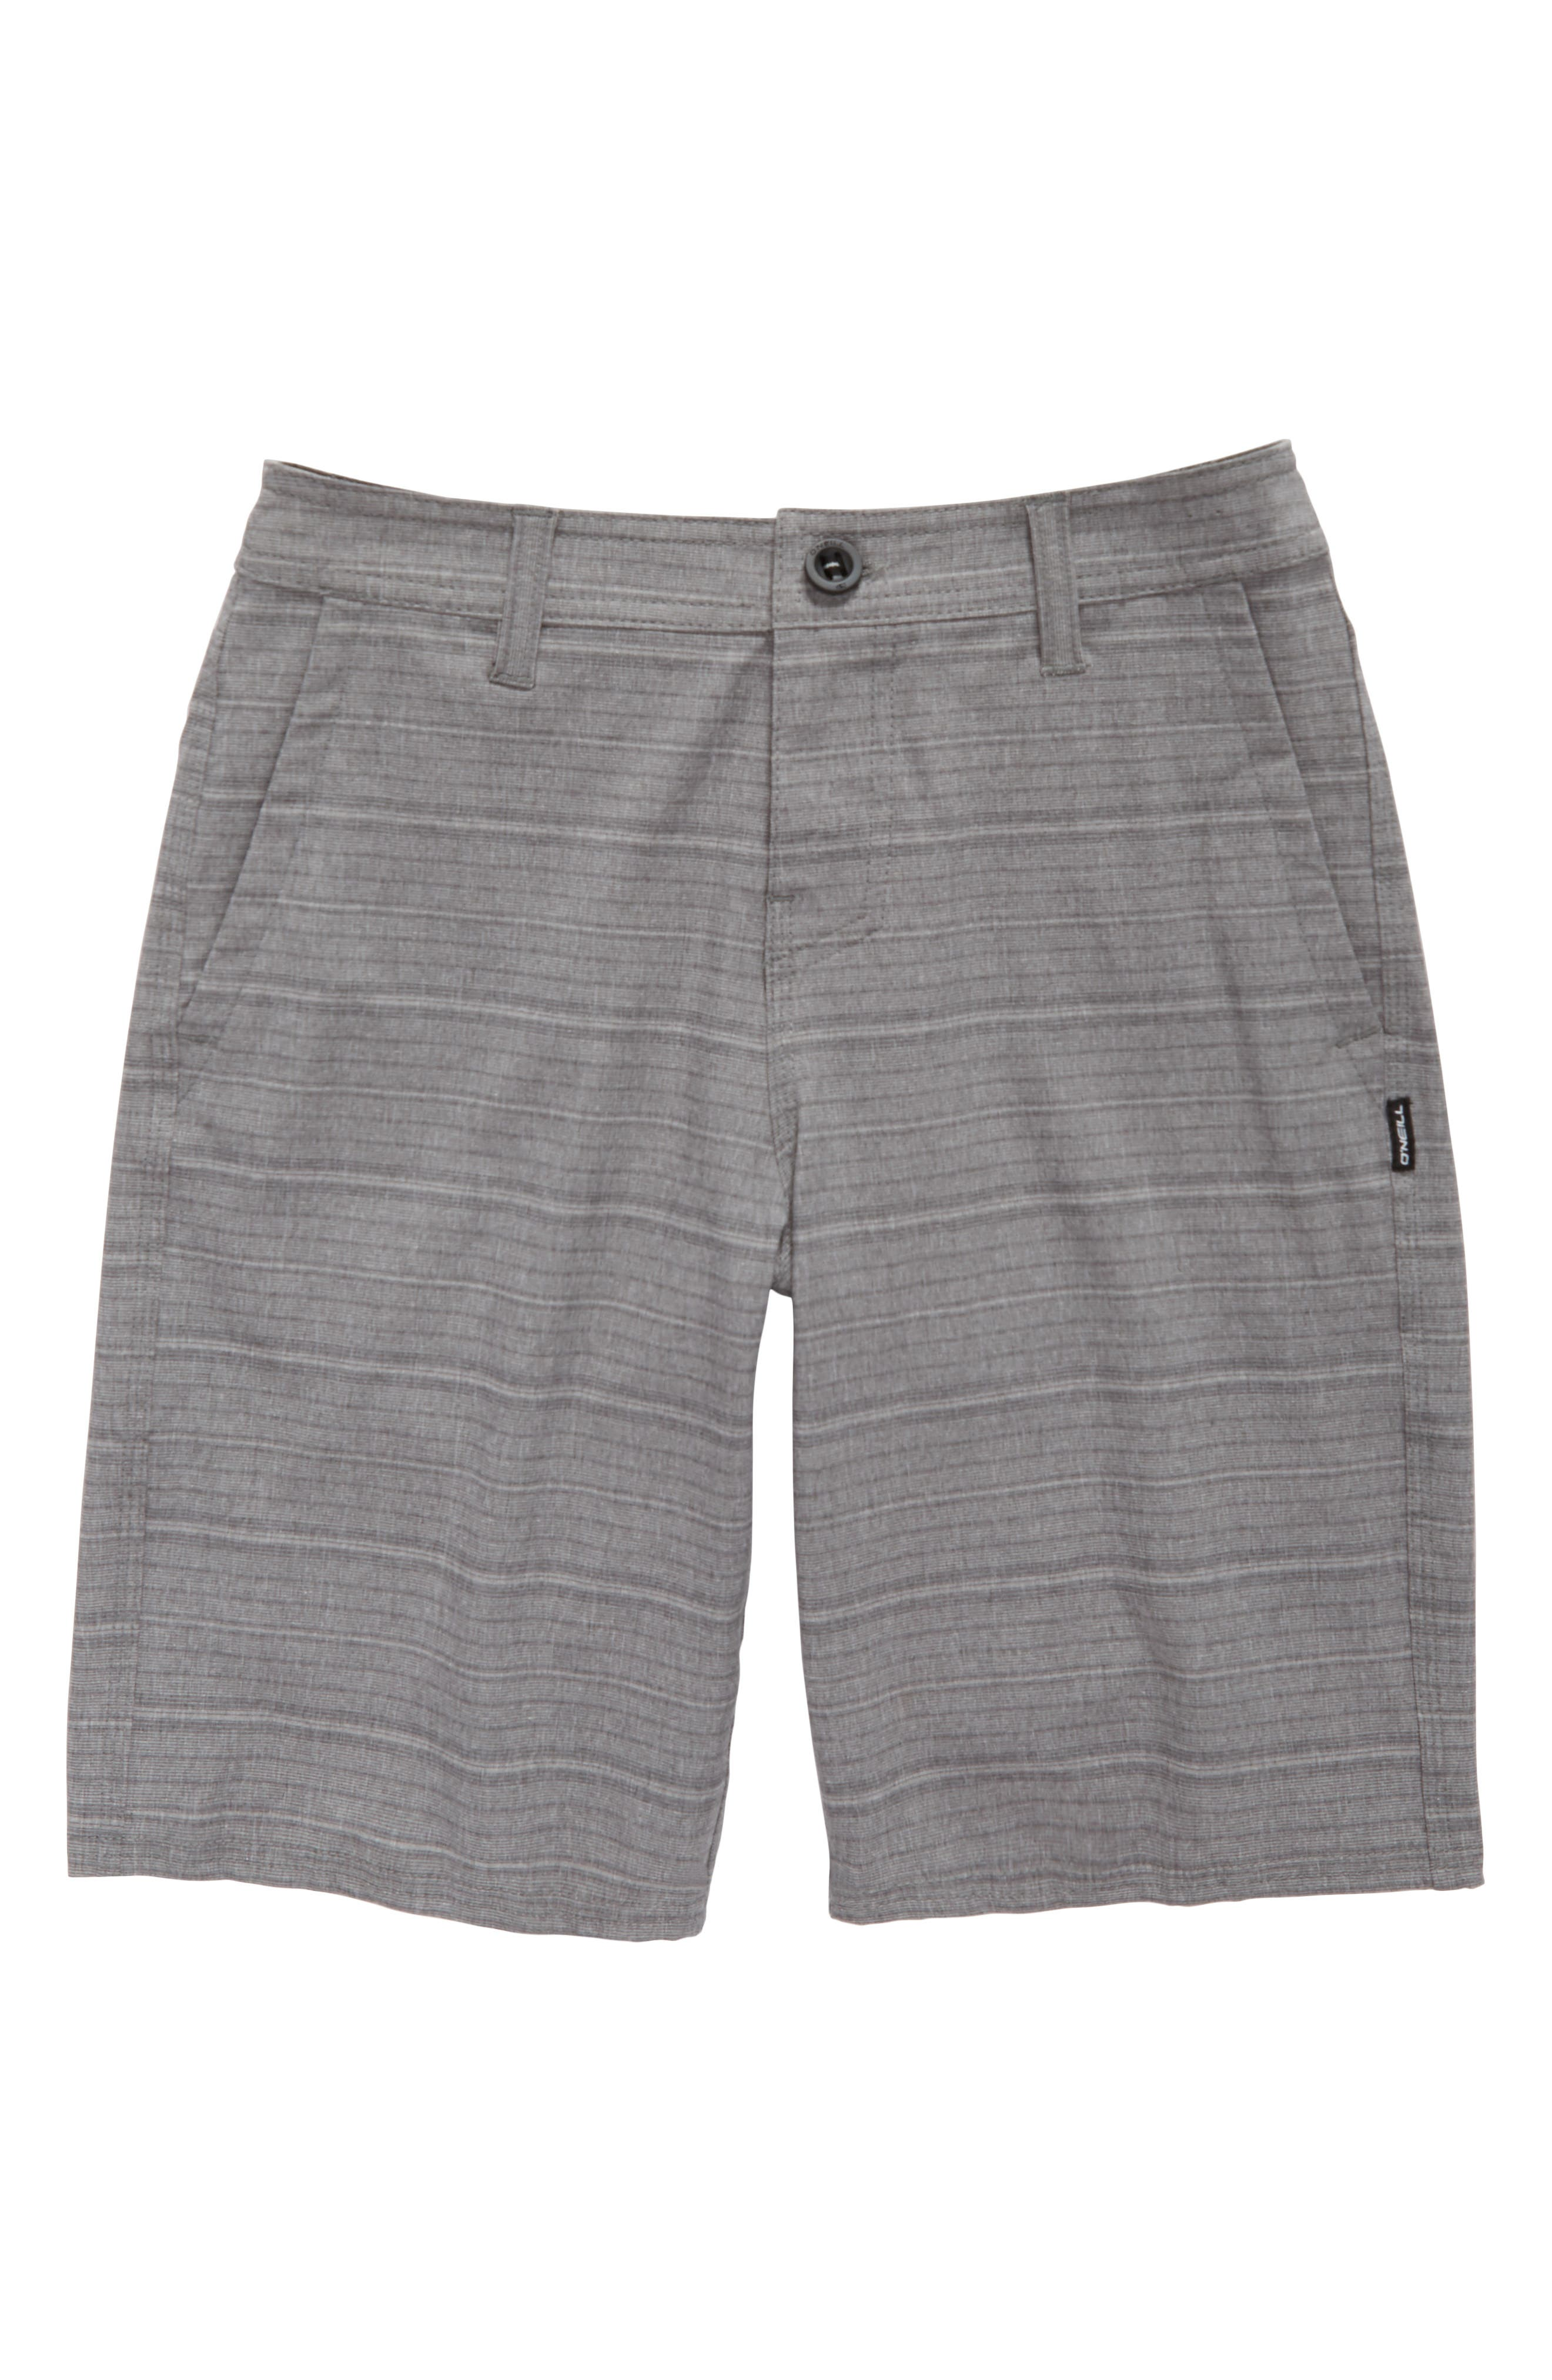 Locked Stripe Hybrid Shorts,                             Main thumbnail 1, color,                             020